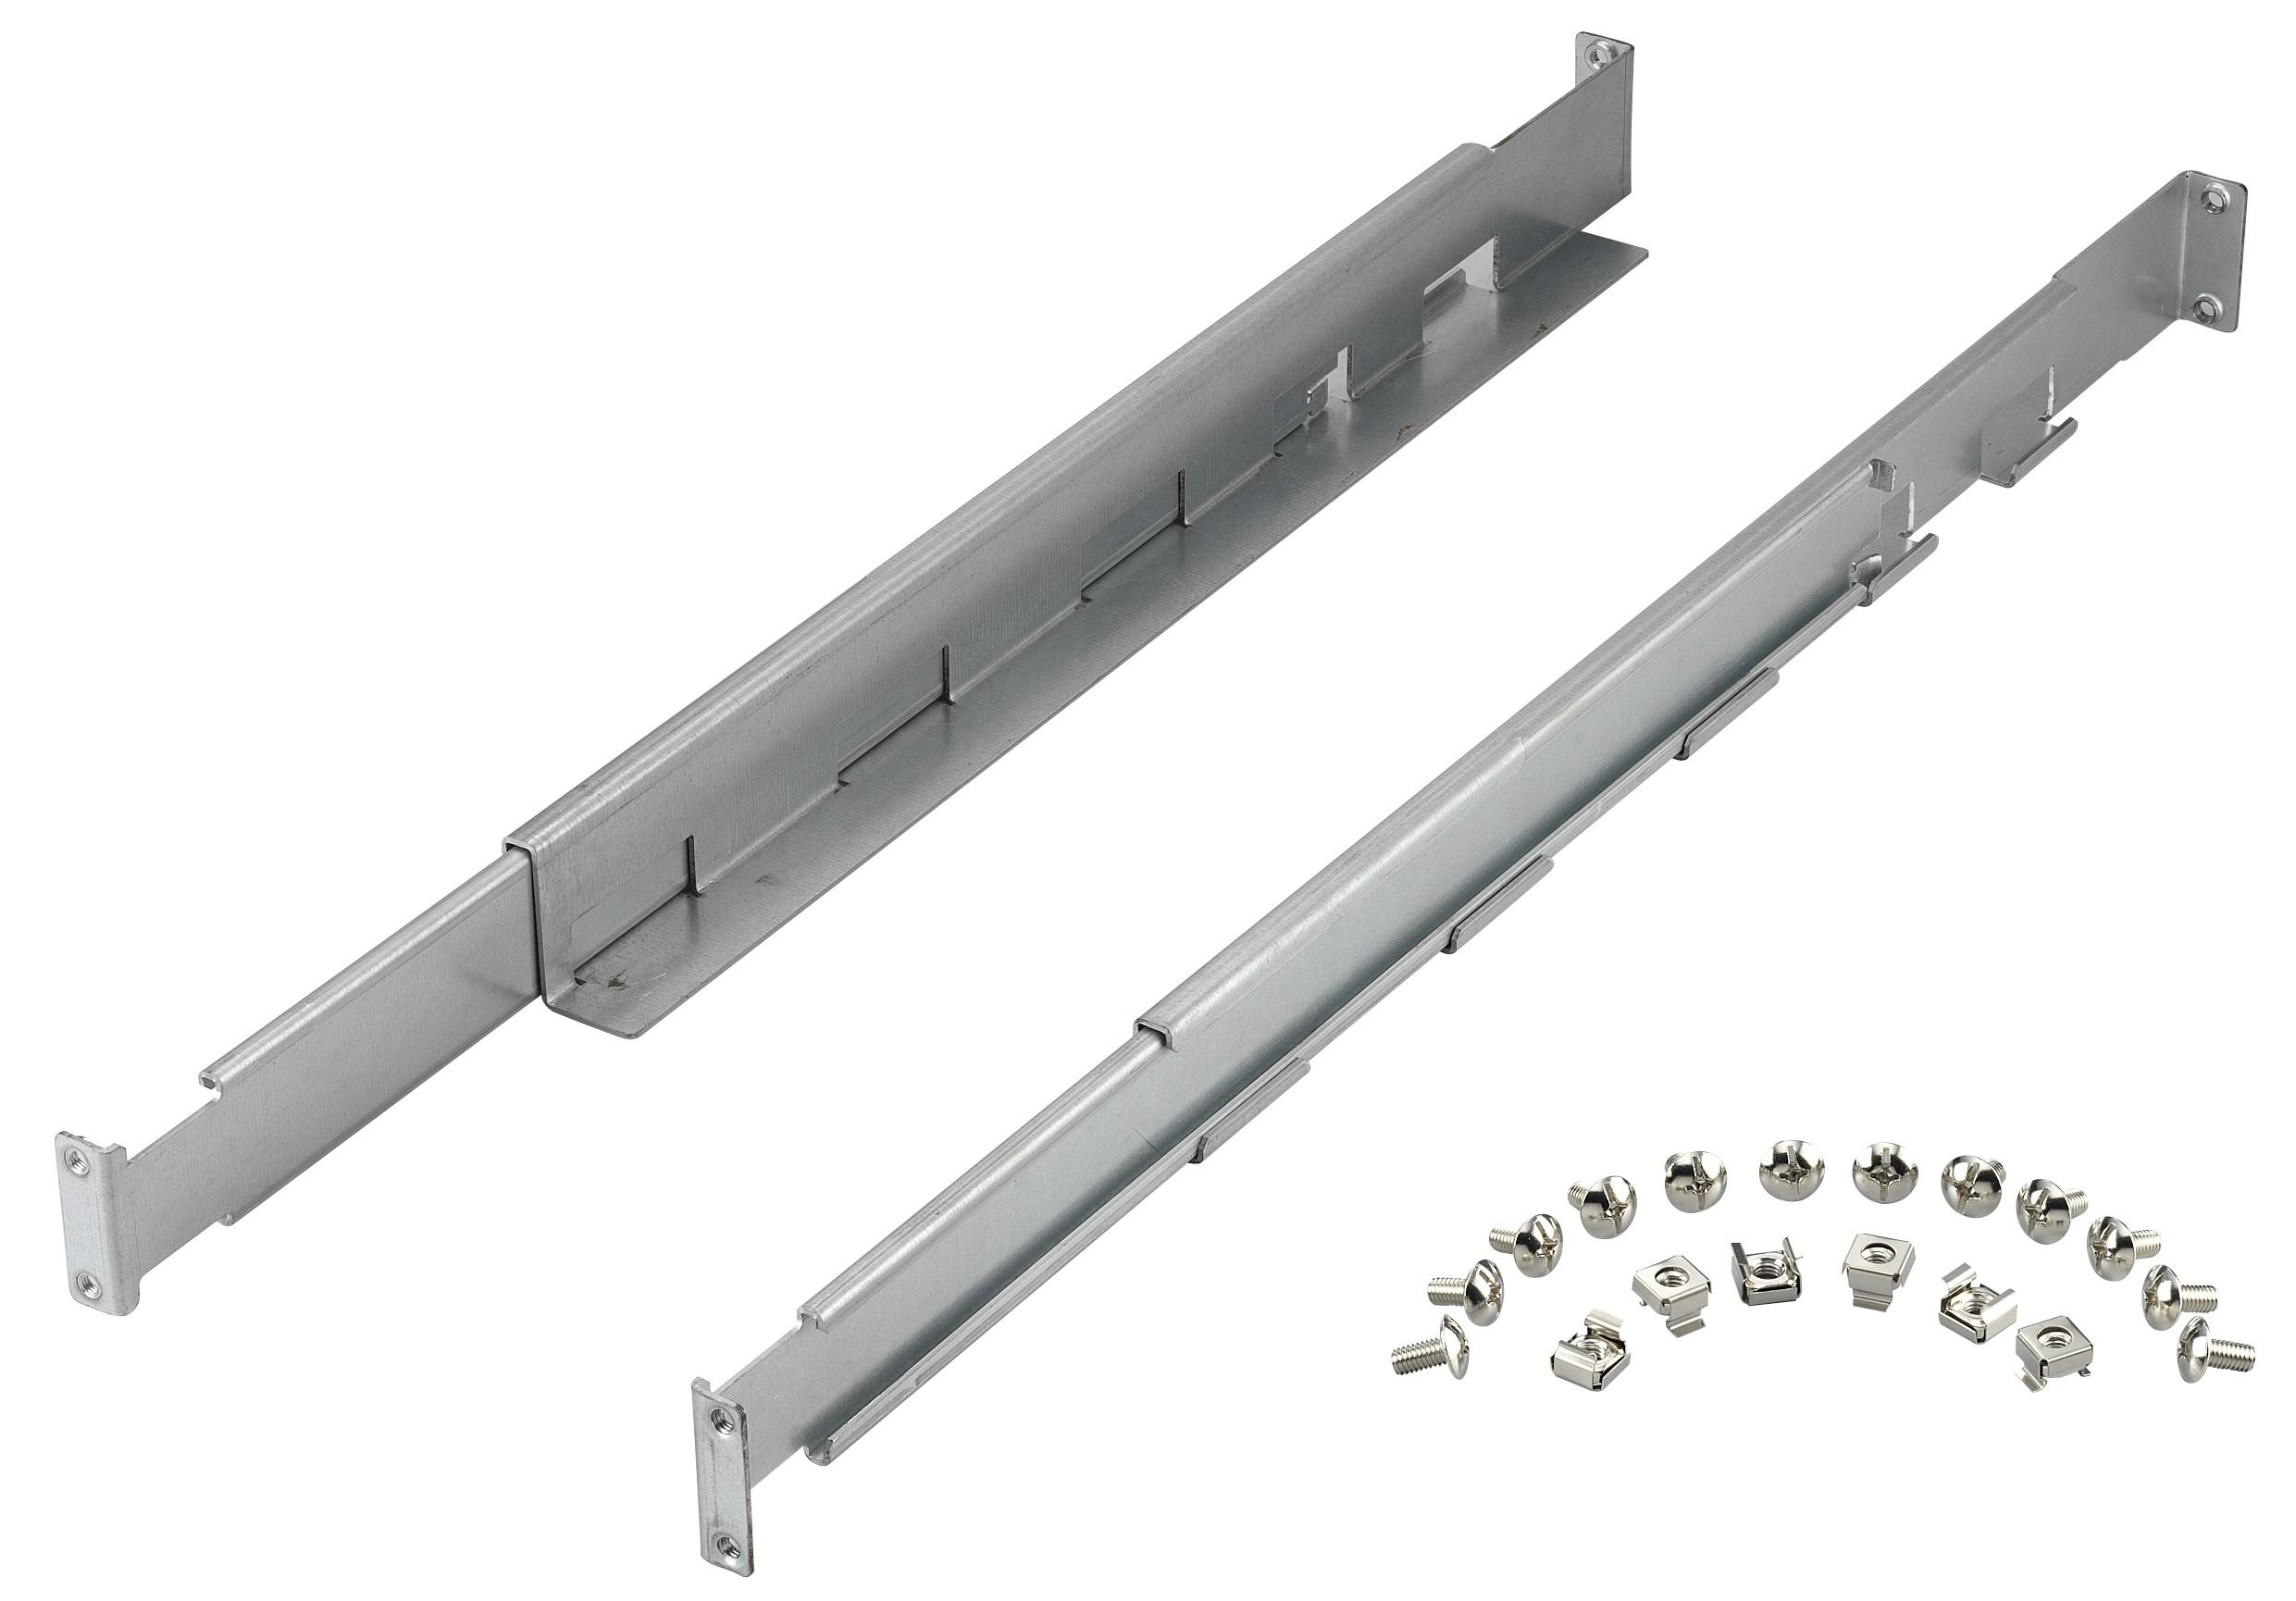 SALICRU Rack Rails f/ SLC Advance RT2 or SLC Twin RT2 - Regal-Schienenset - Aluminium - 60 kg - SLC Advance RT2 / SLC Twin RT2 - 550 mm - 110 cm